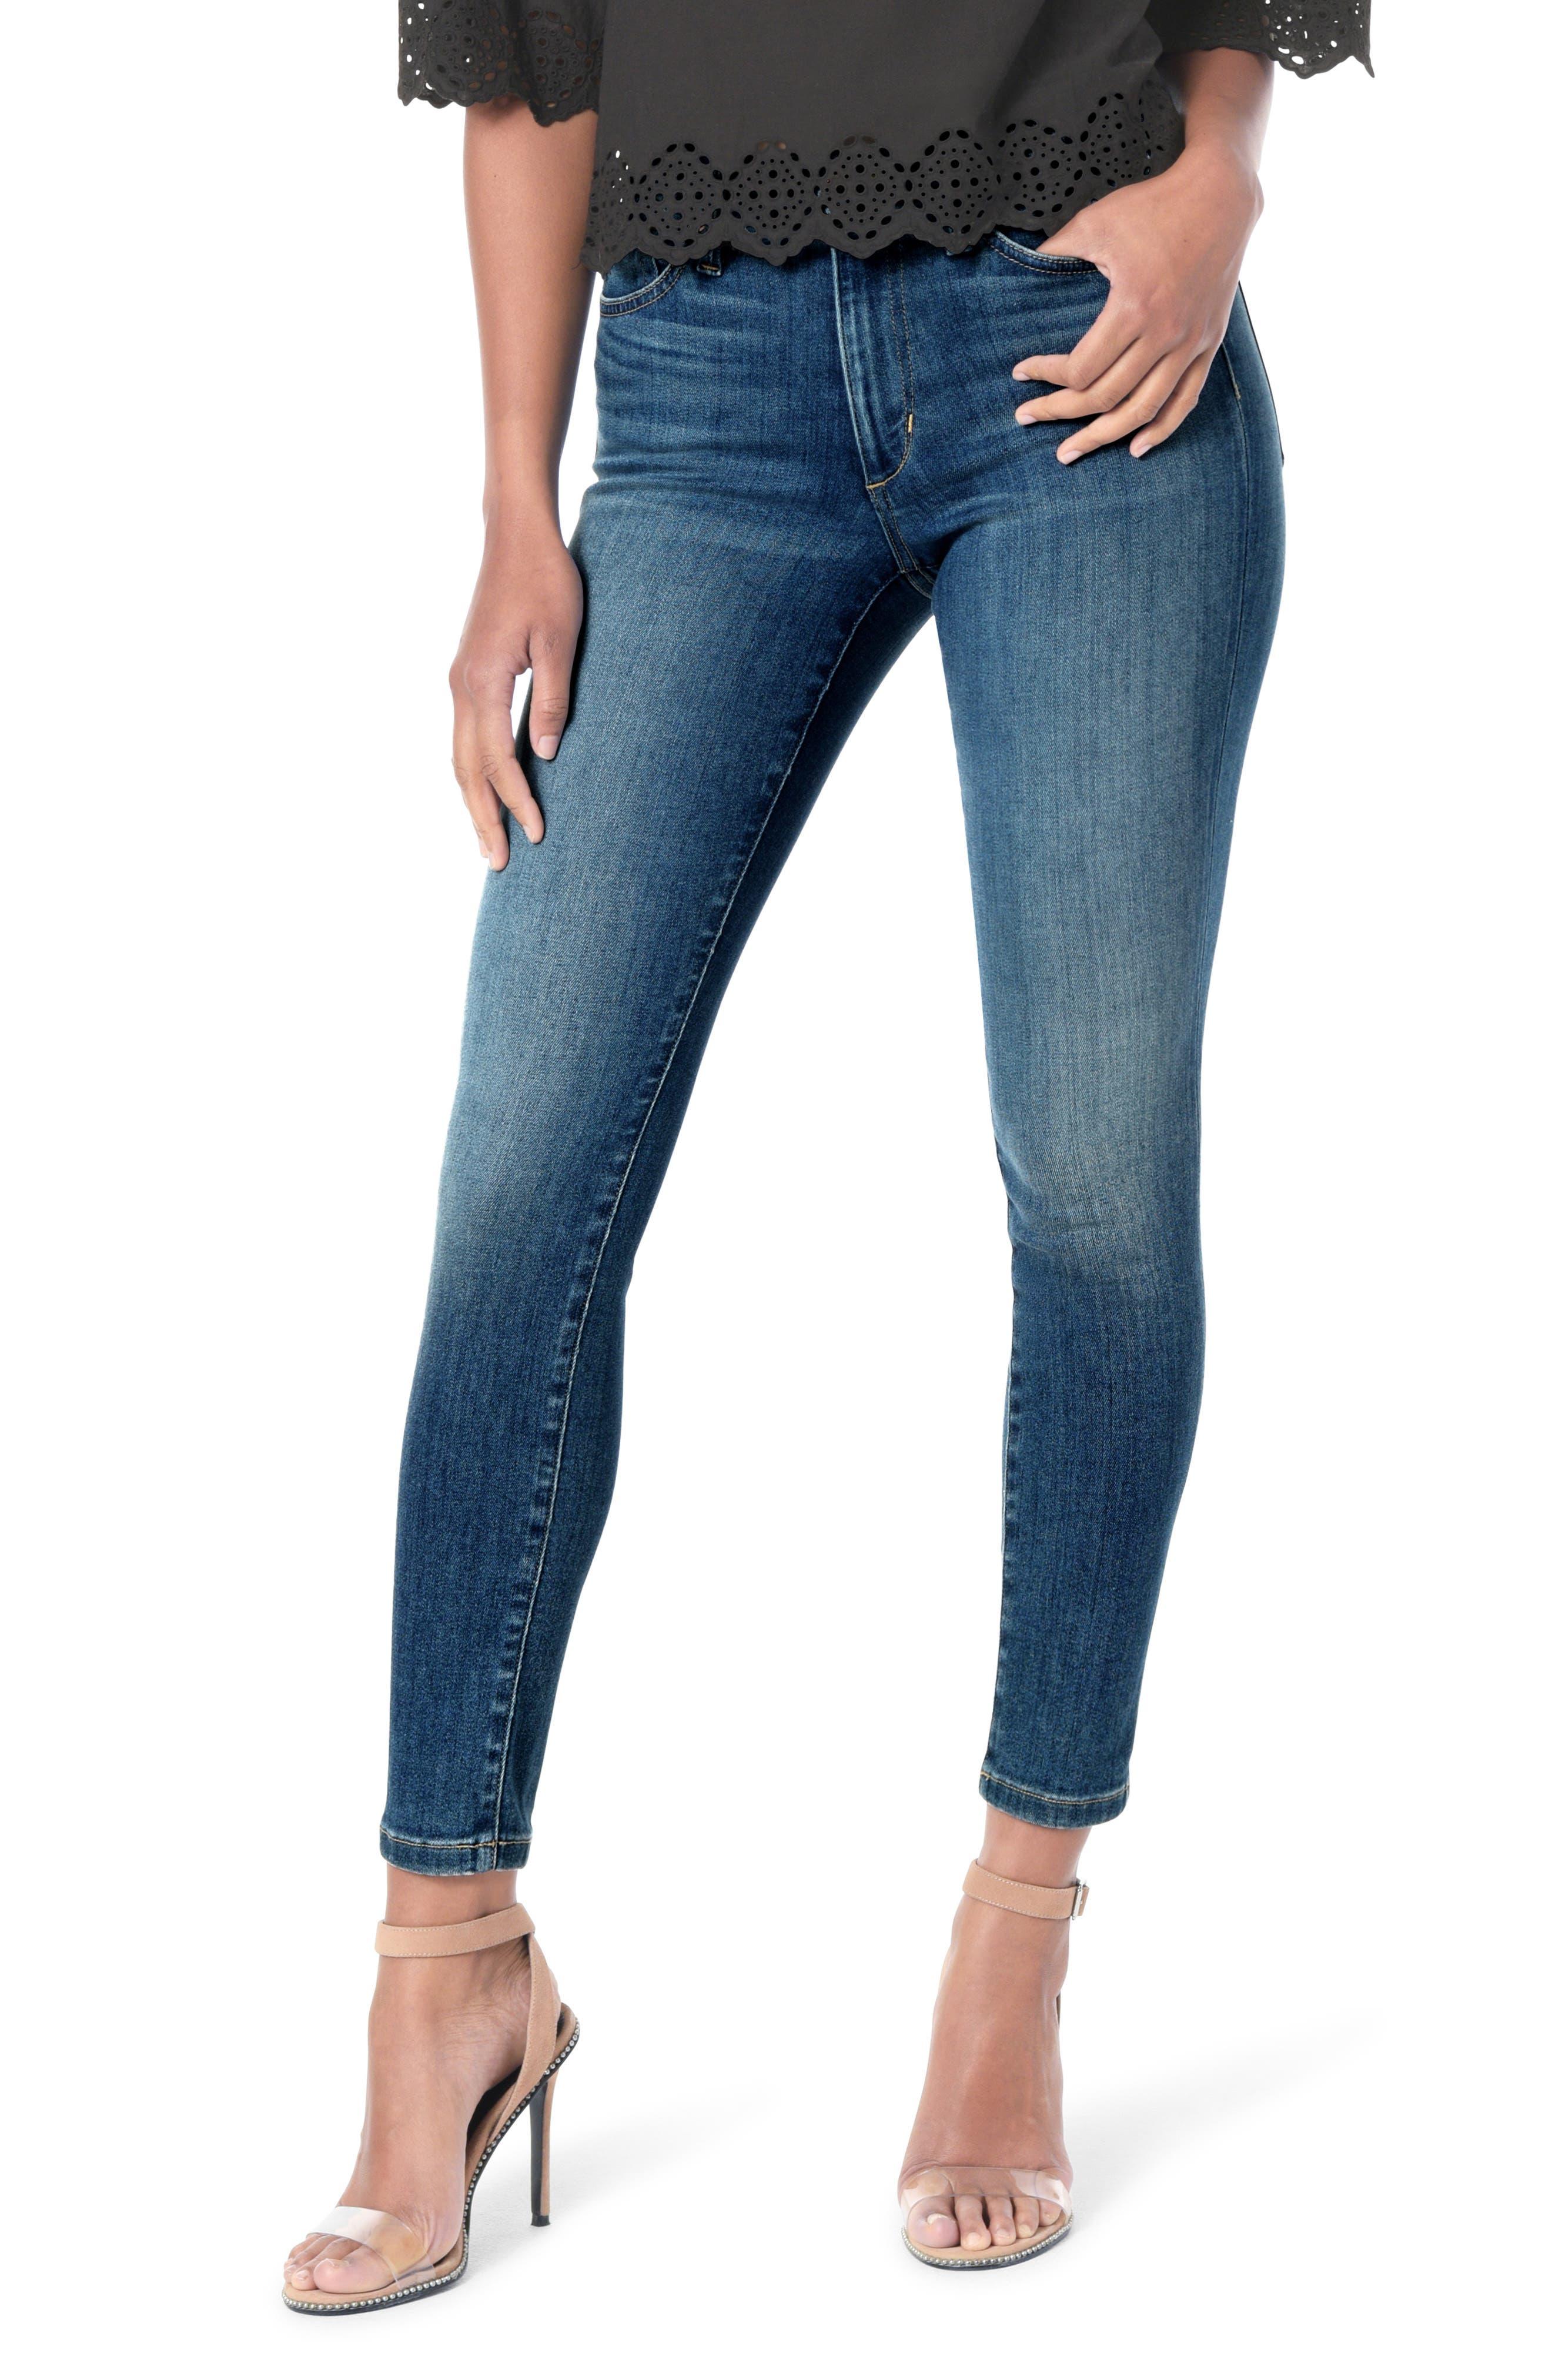 Joe's Jeans Flawless - Honey Curvy High Waist Ankle Skinny Jeans